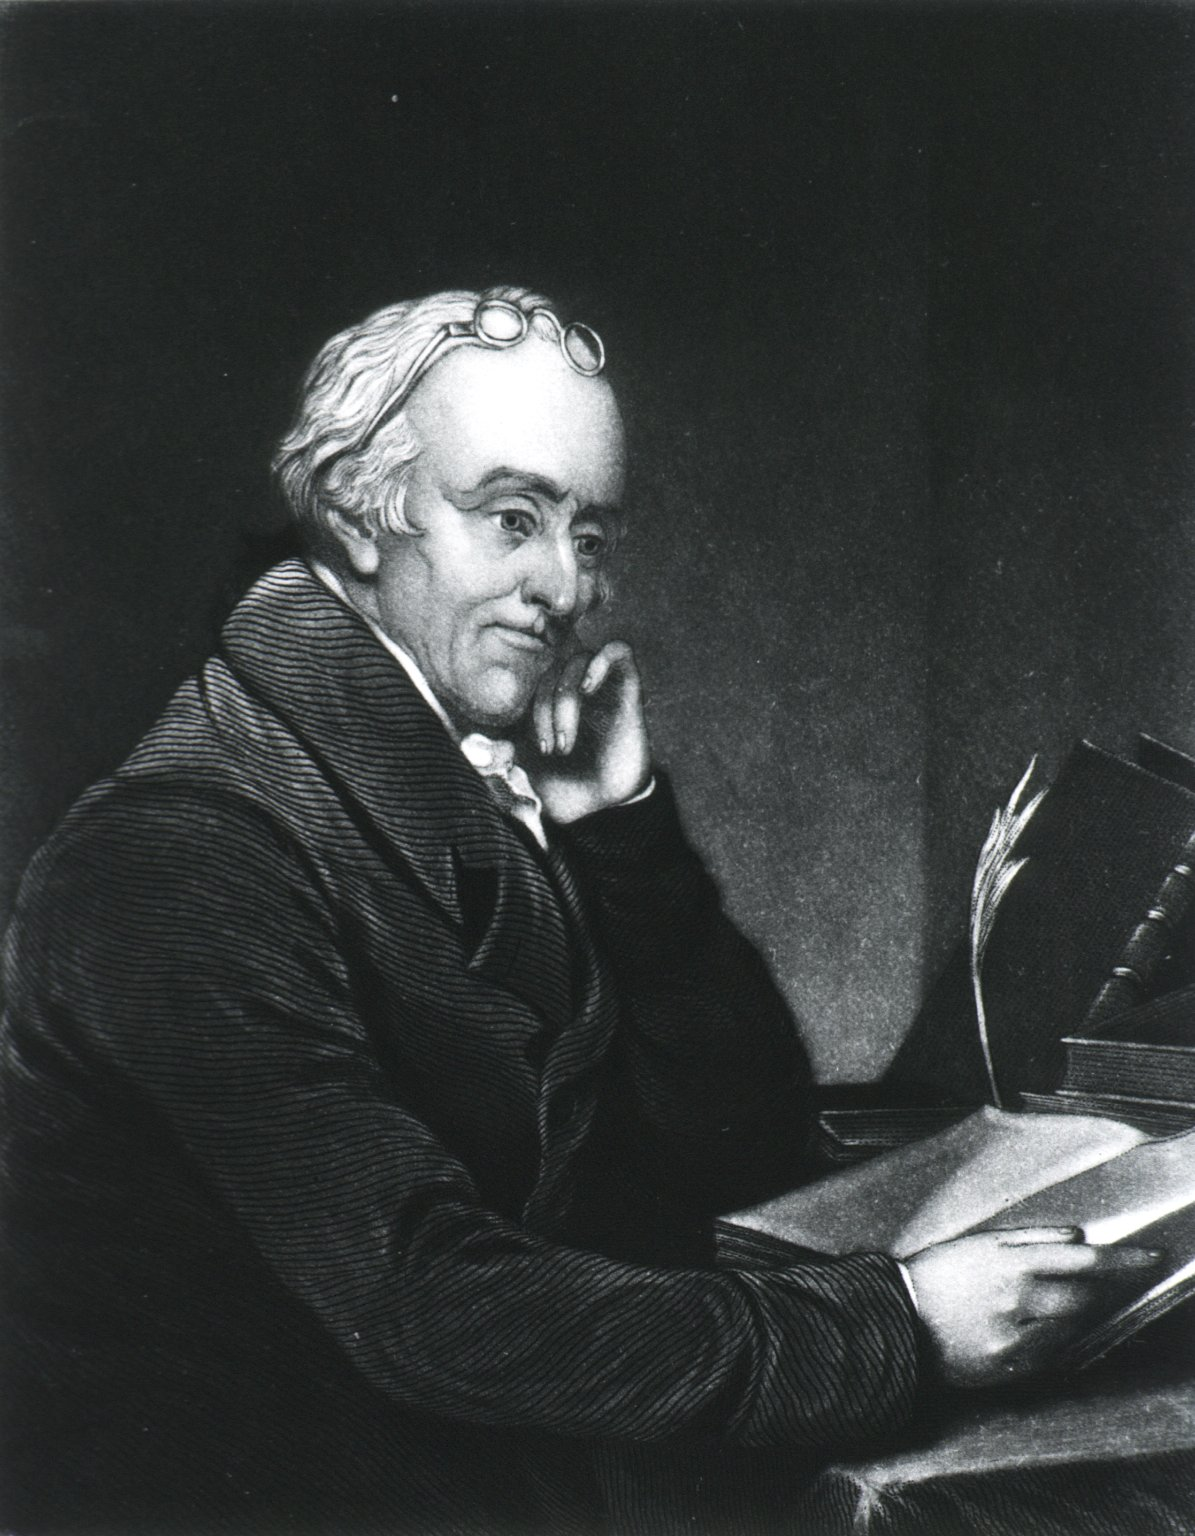 benjamin rush Benjamin rush, eminent physician, writer, educator, humanitarian was born in december of 1745 in byberry, pennsylvania, twelve miles from philadelphia his father died when benjamin was six.